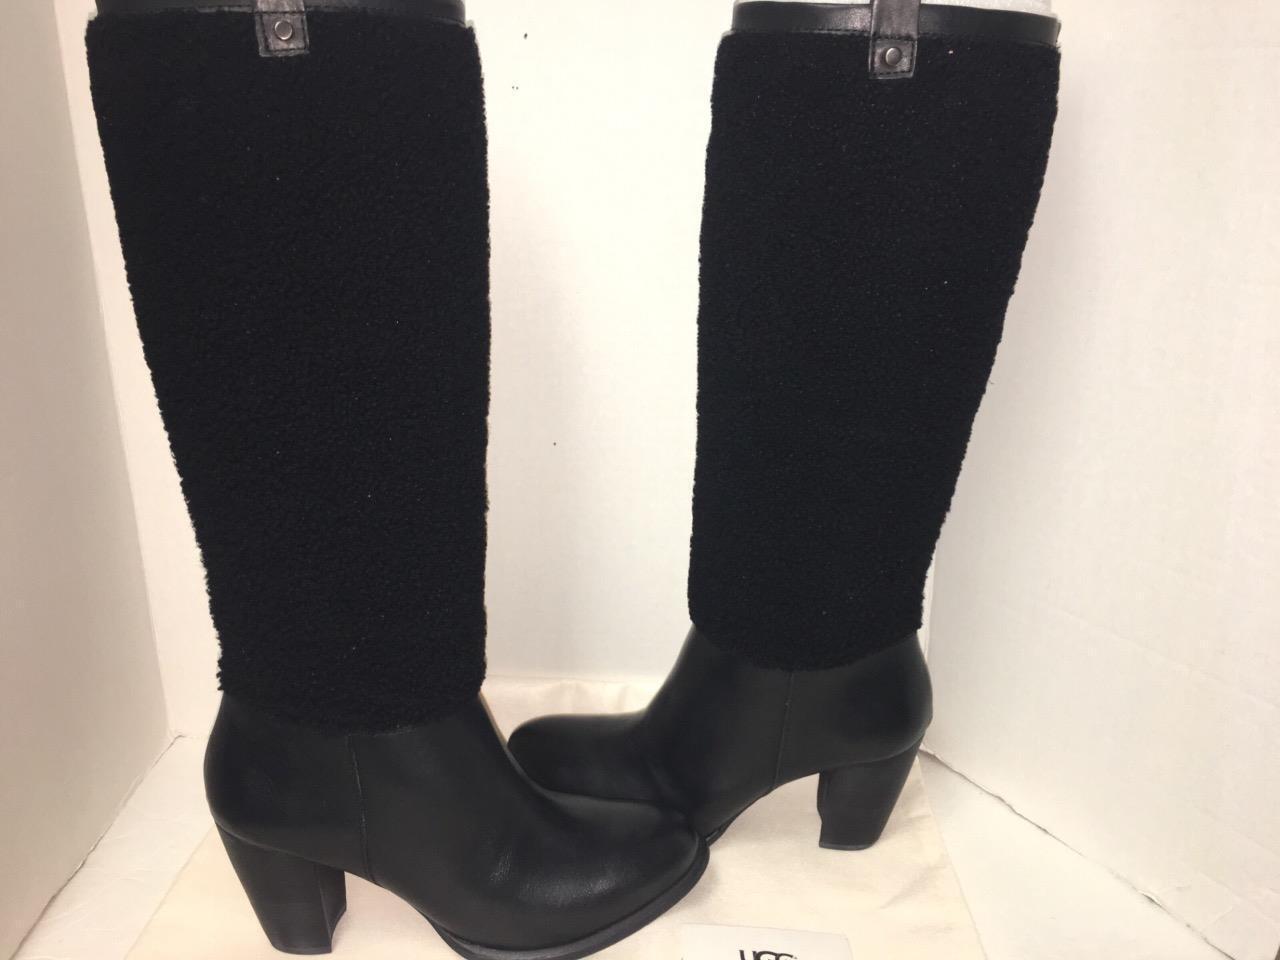 2fc1bc23077 UGG Australia Ava Exposed Fur Black Women BOOTS 1013677 Sz 8